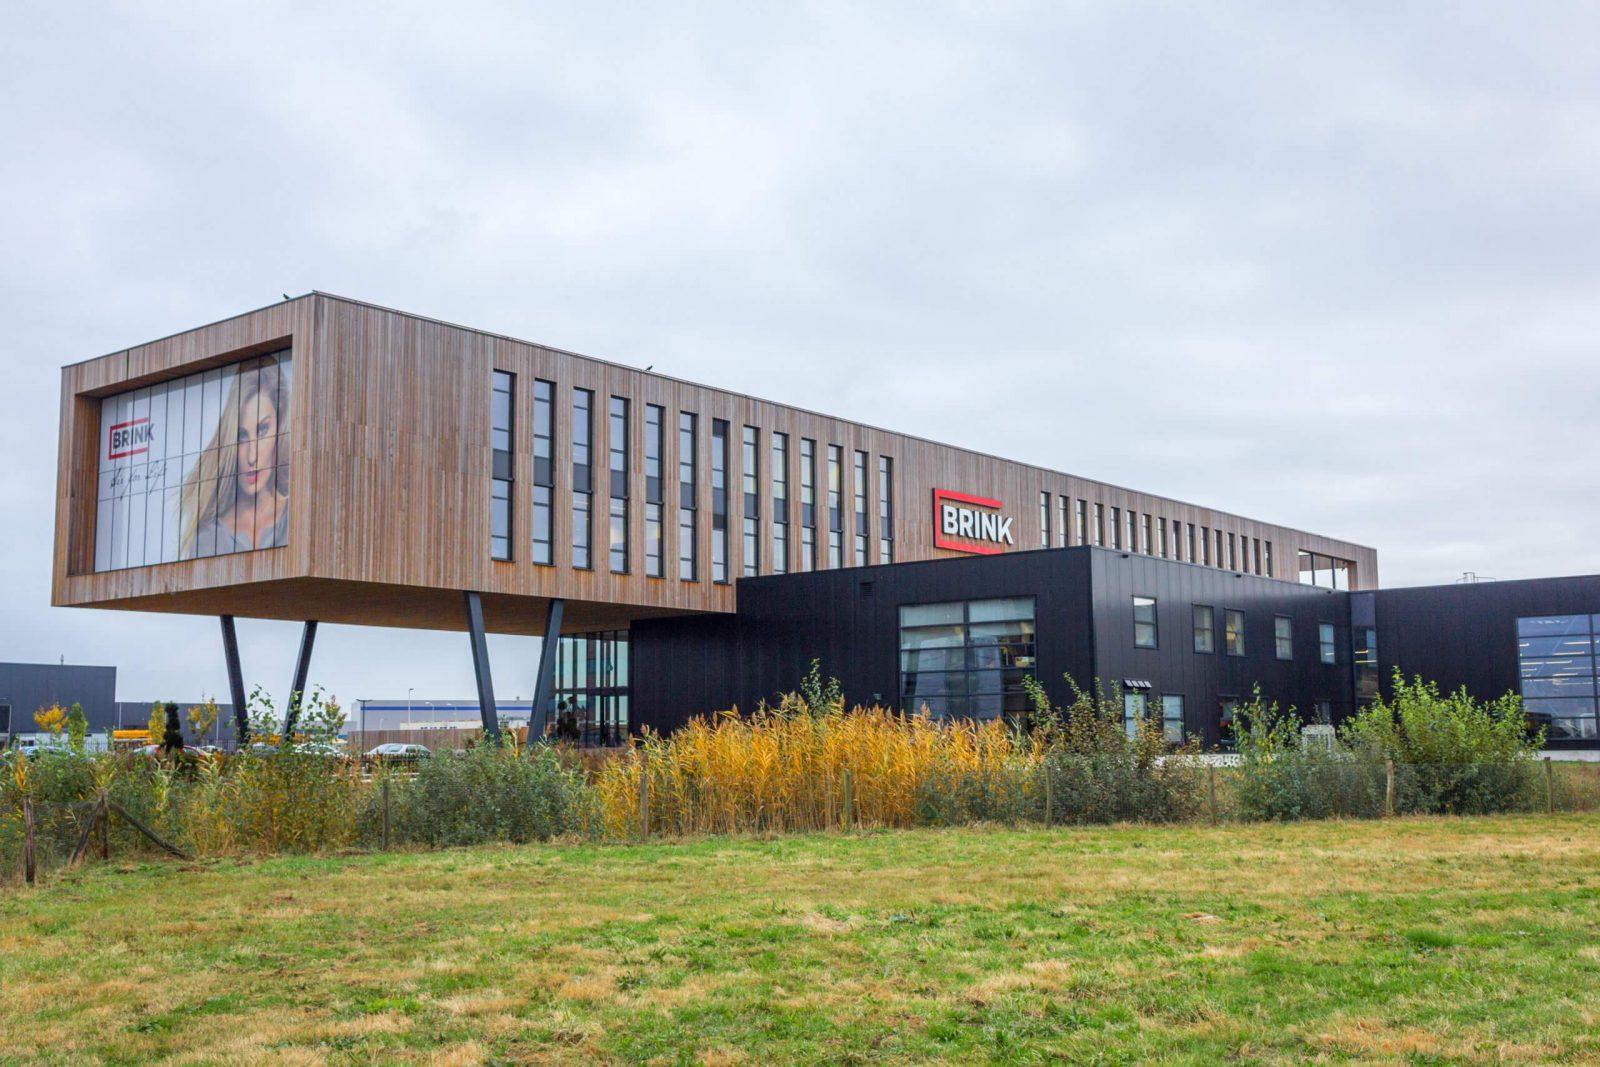 Brink Climate Staphorst 2